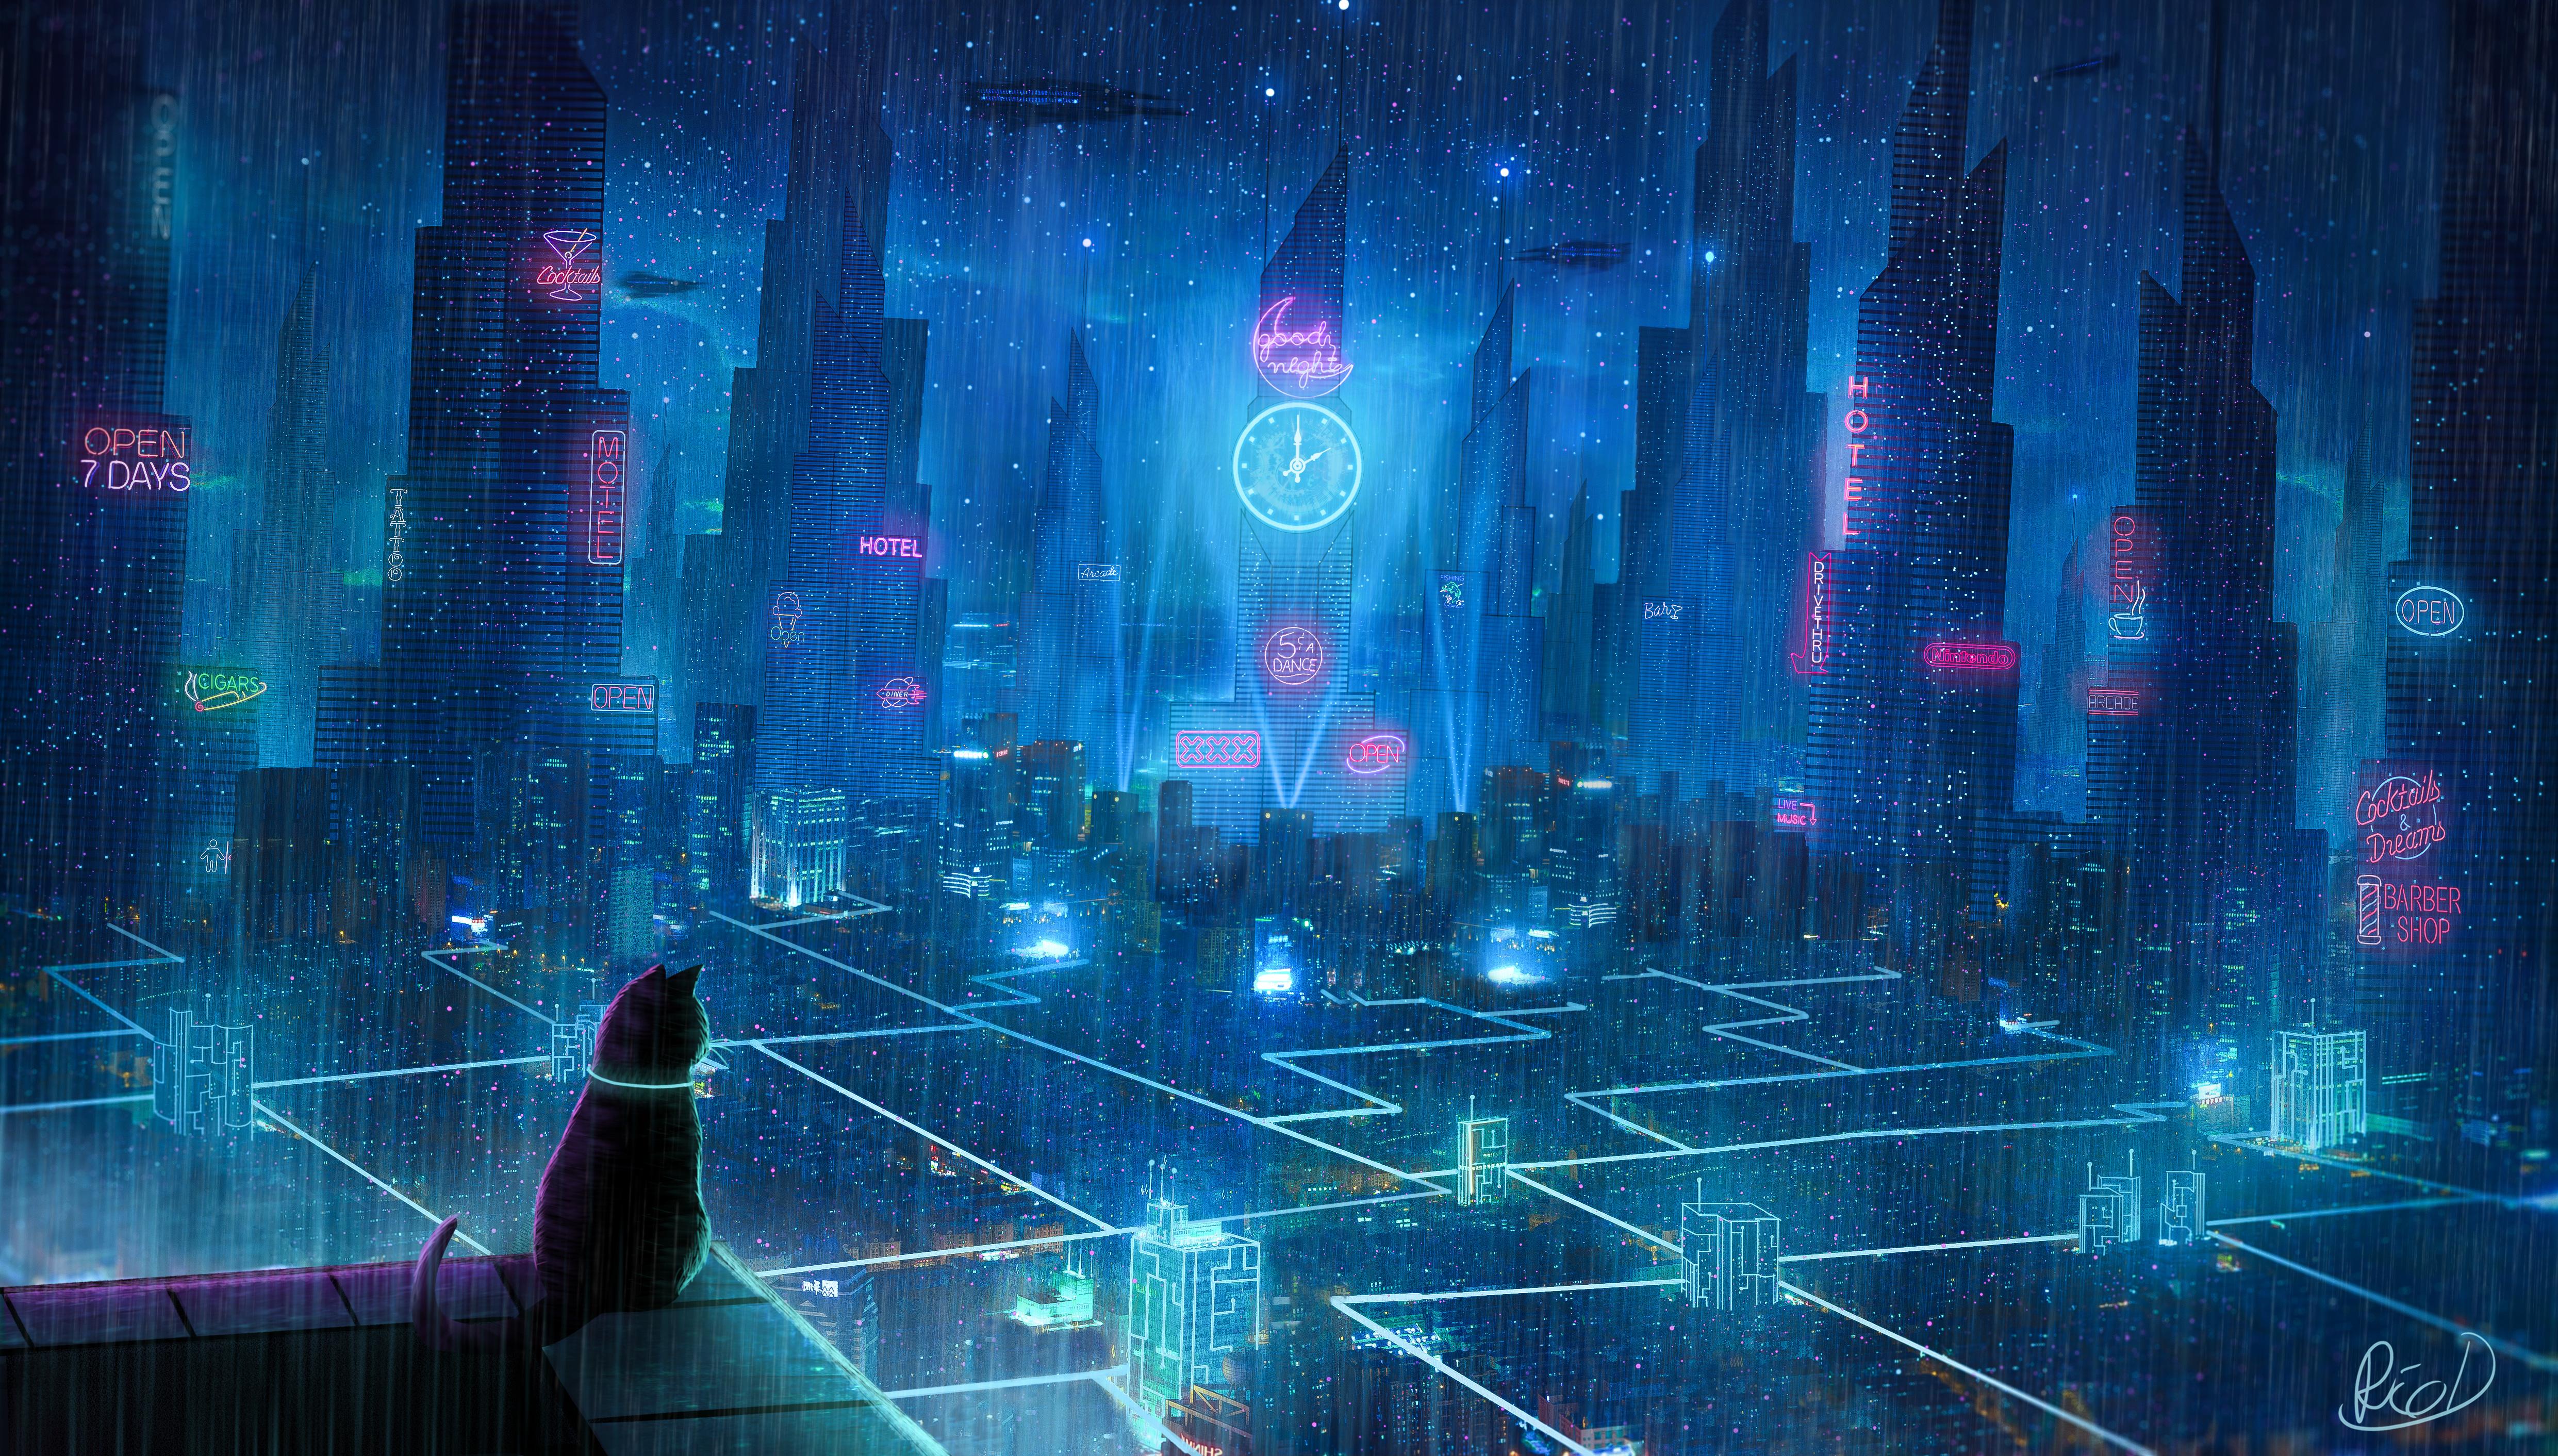 Cat Rain Dream Cyberpunk City 4k, HD Artist, 4k Wallpapers ...